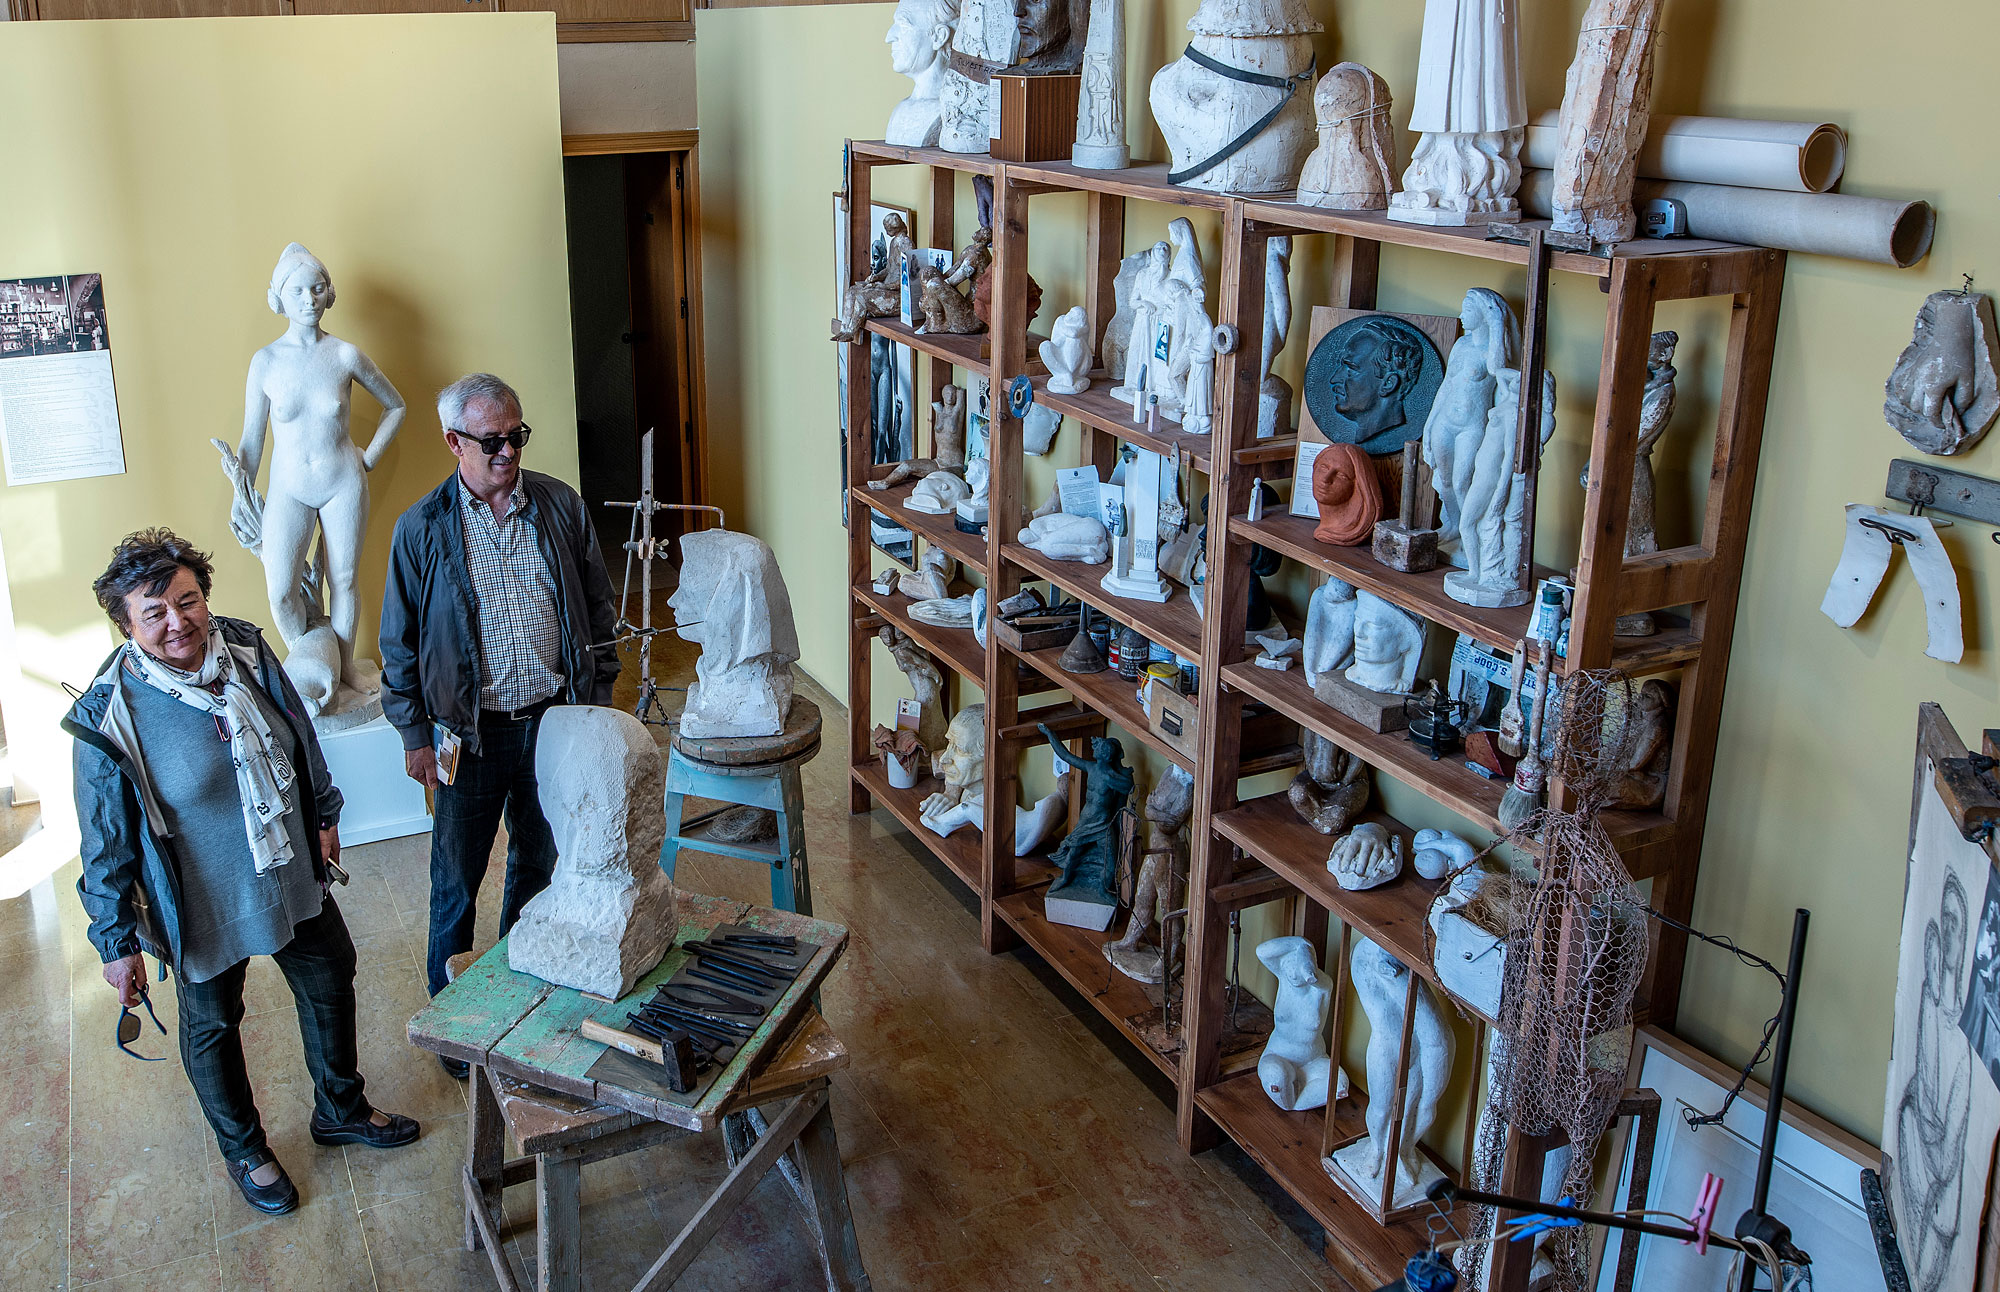 Turisme Lliria - Museu Silvestre d'Edeta - Taller